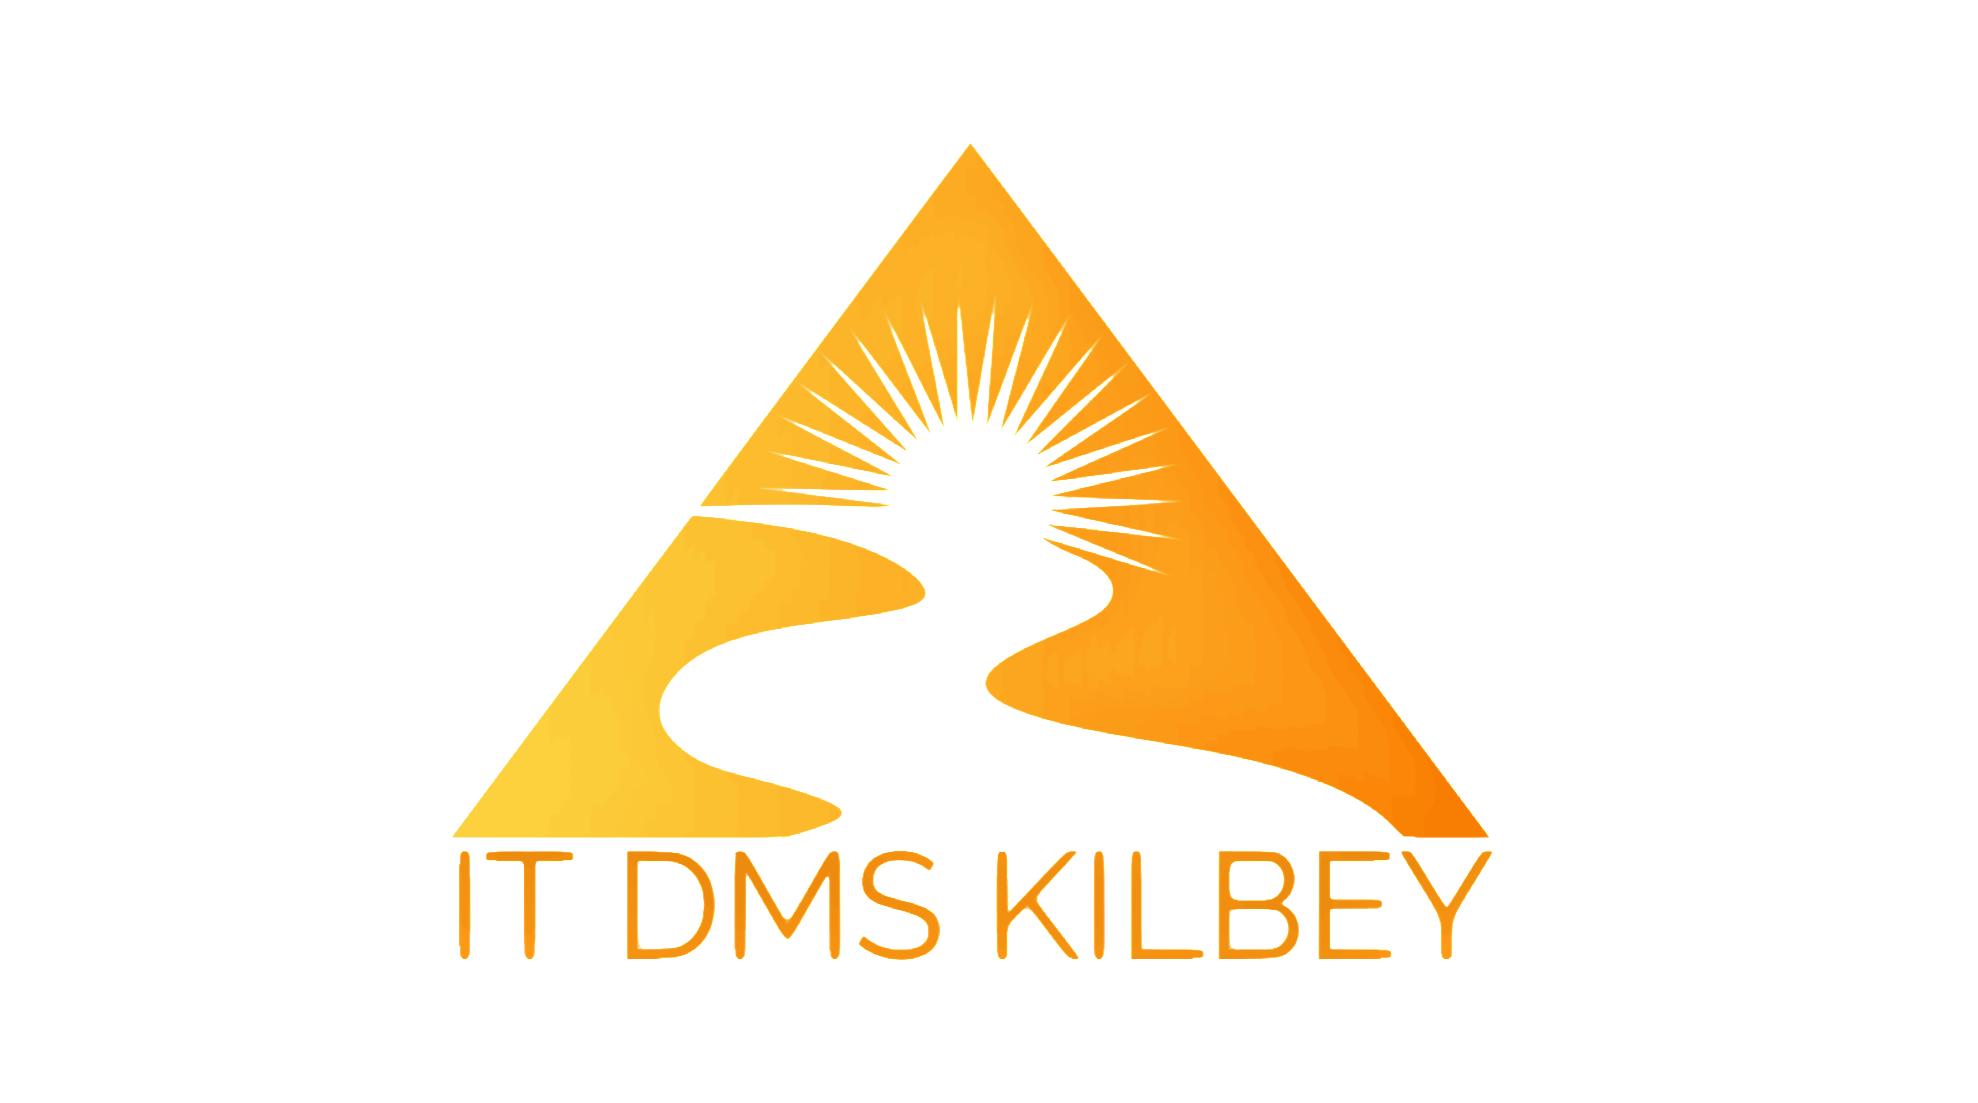 ITDMS_Kilbey_logo